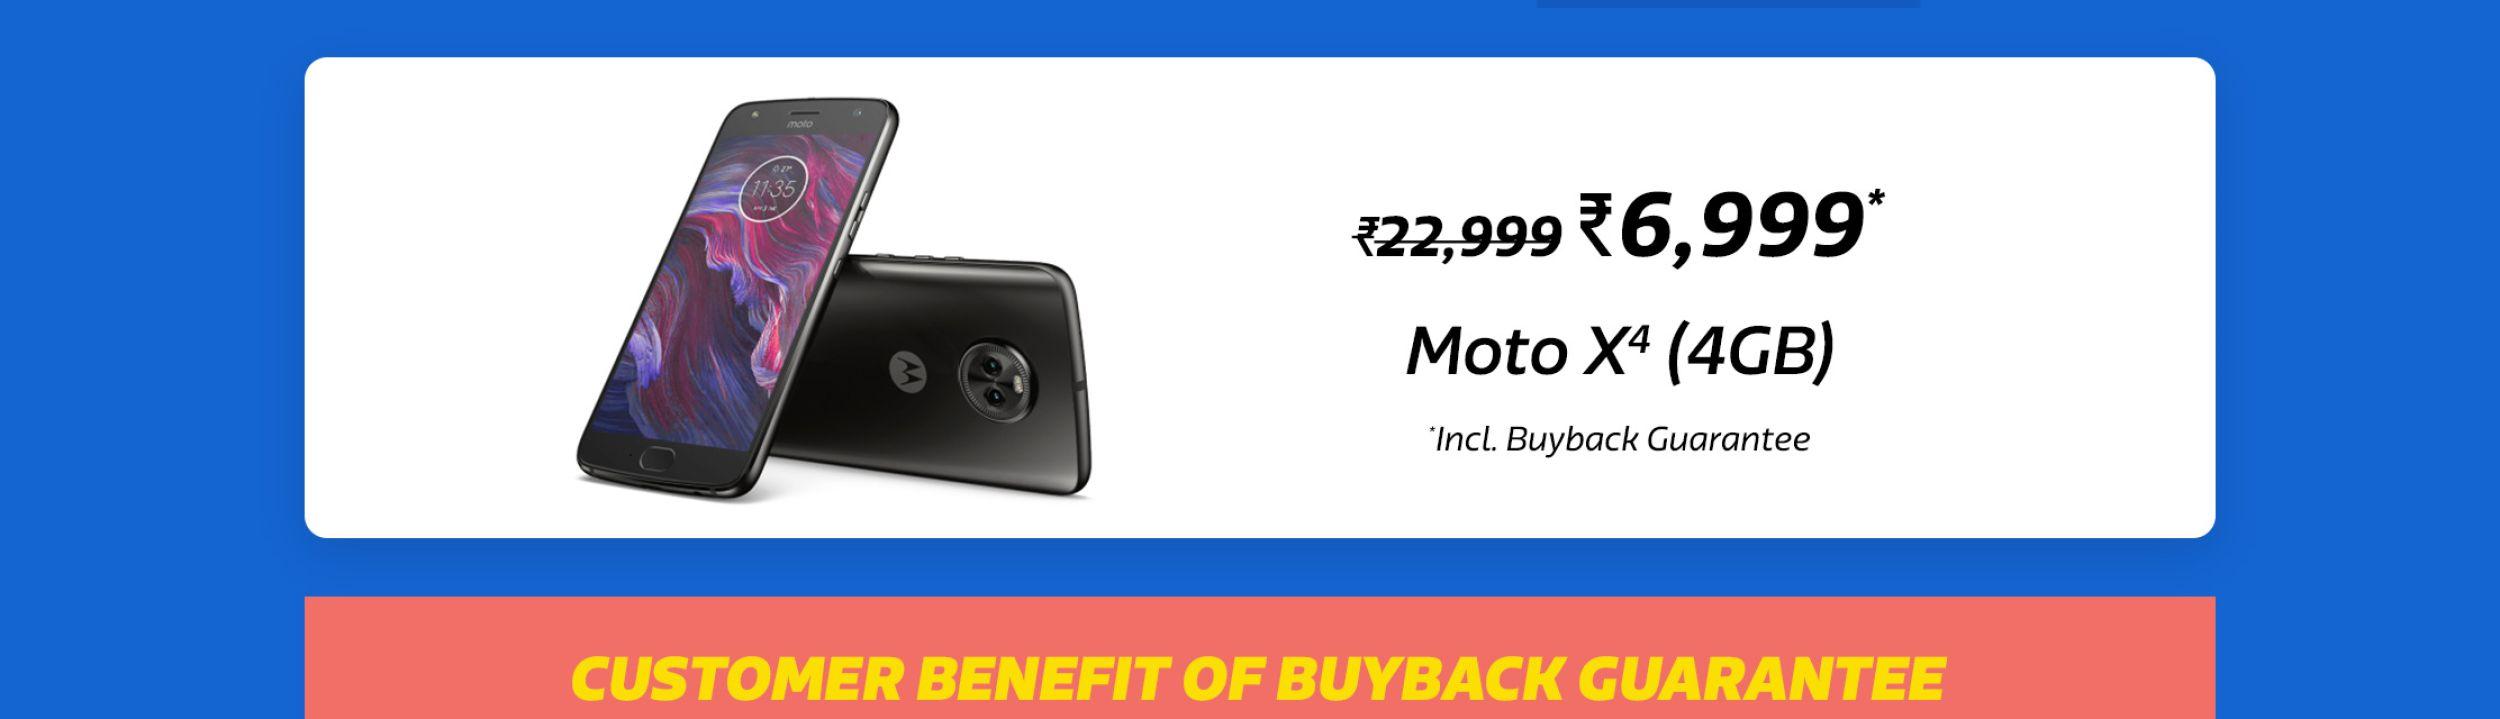 Moto X4 SVW-BBG-CC